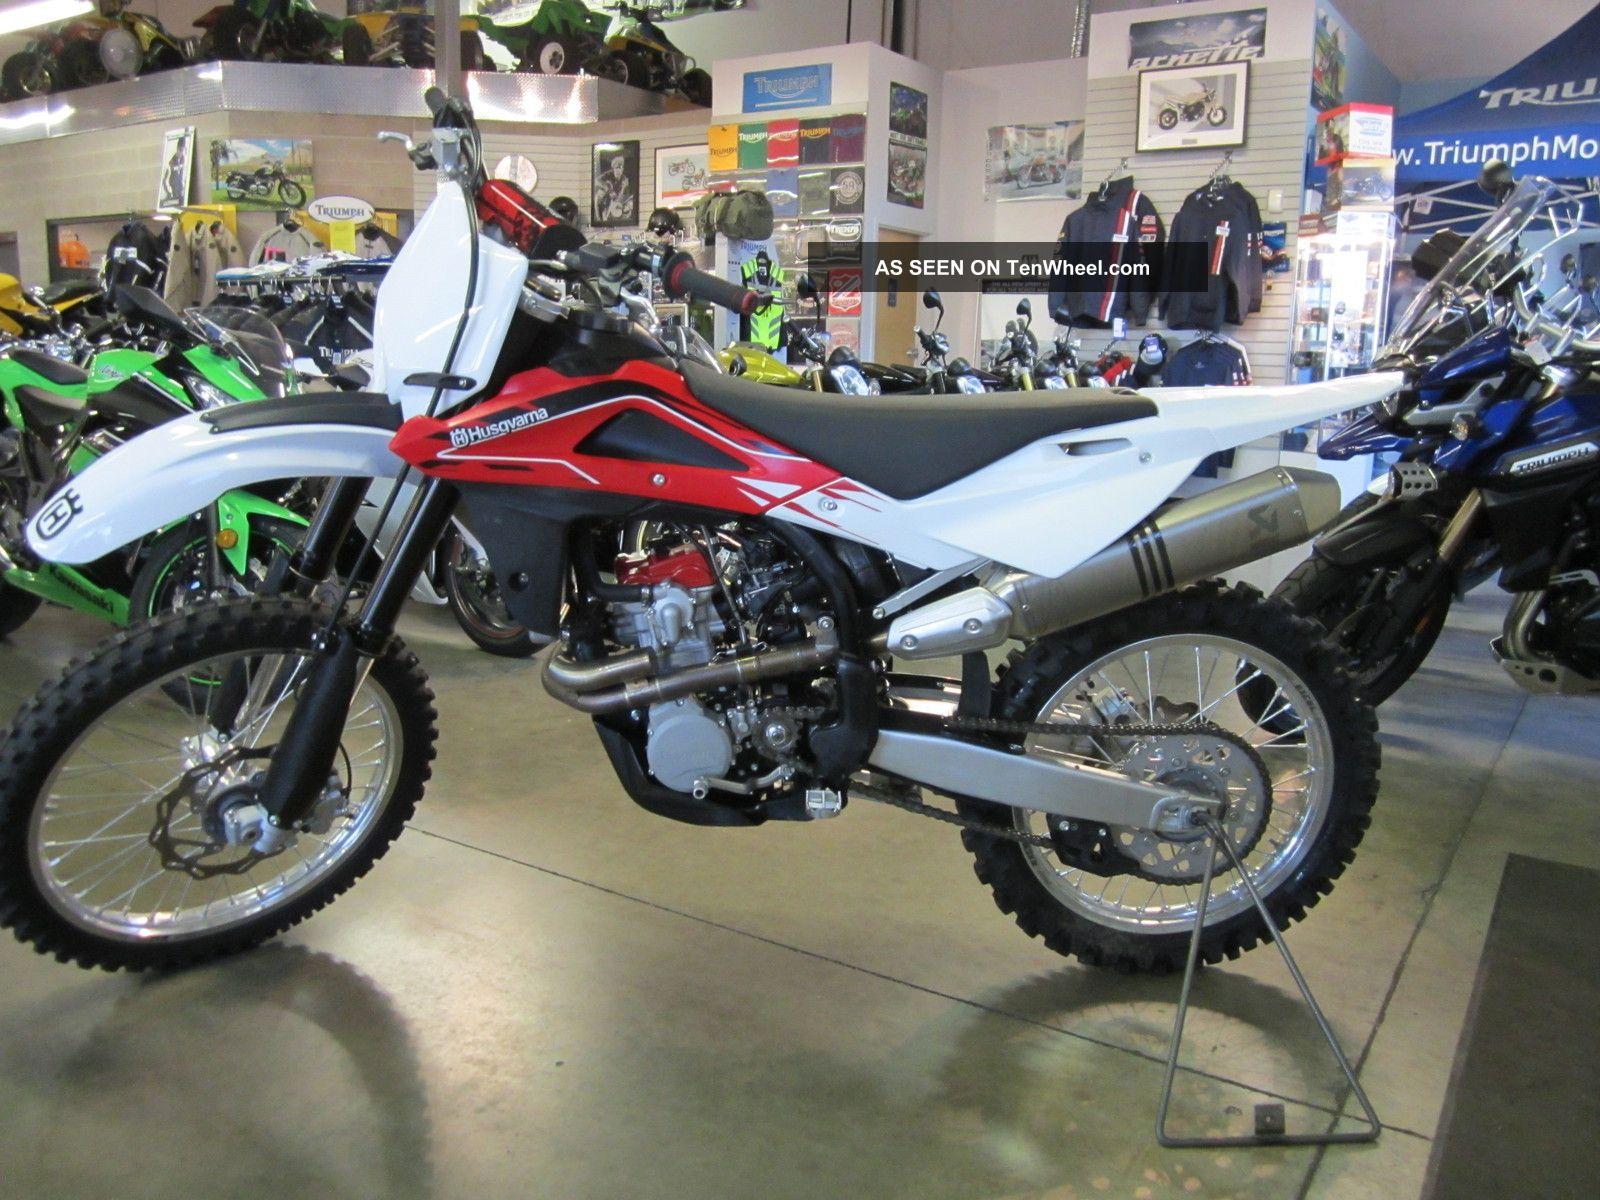 2013 Husqvarna Tc 250r Off - Road Motorcycle Demo Model Was $7199 Now $1.  00 Nr Husqvarna photo